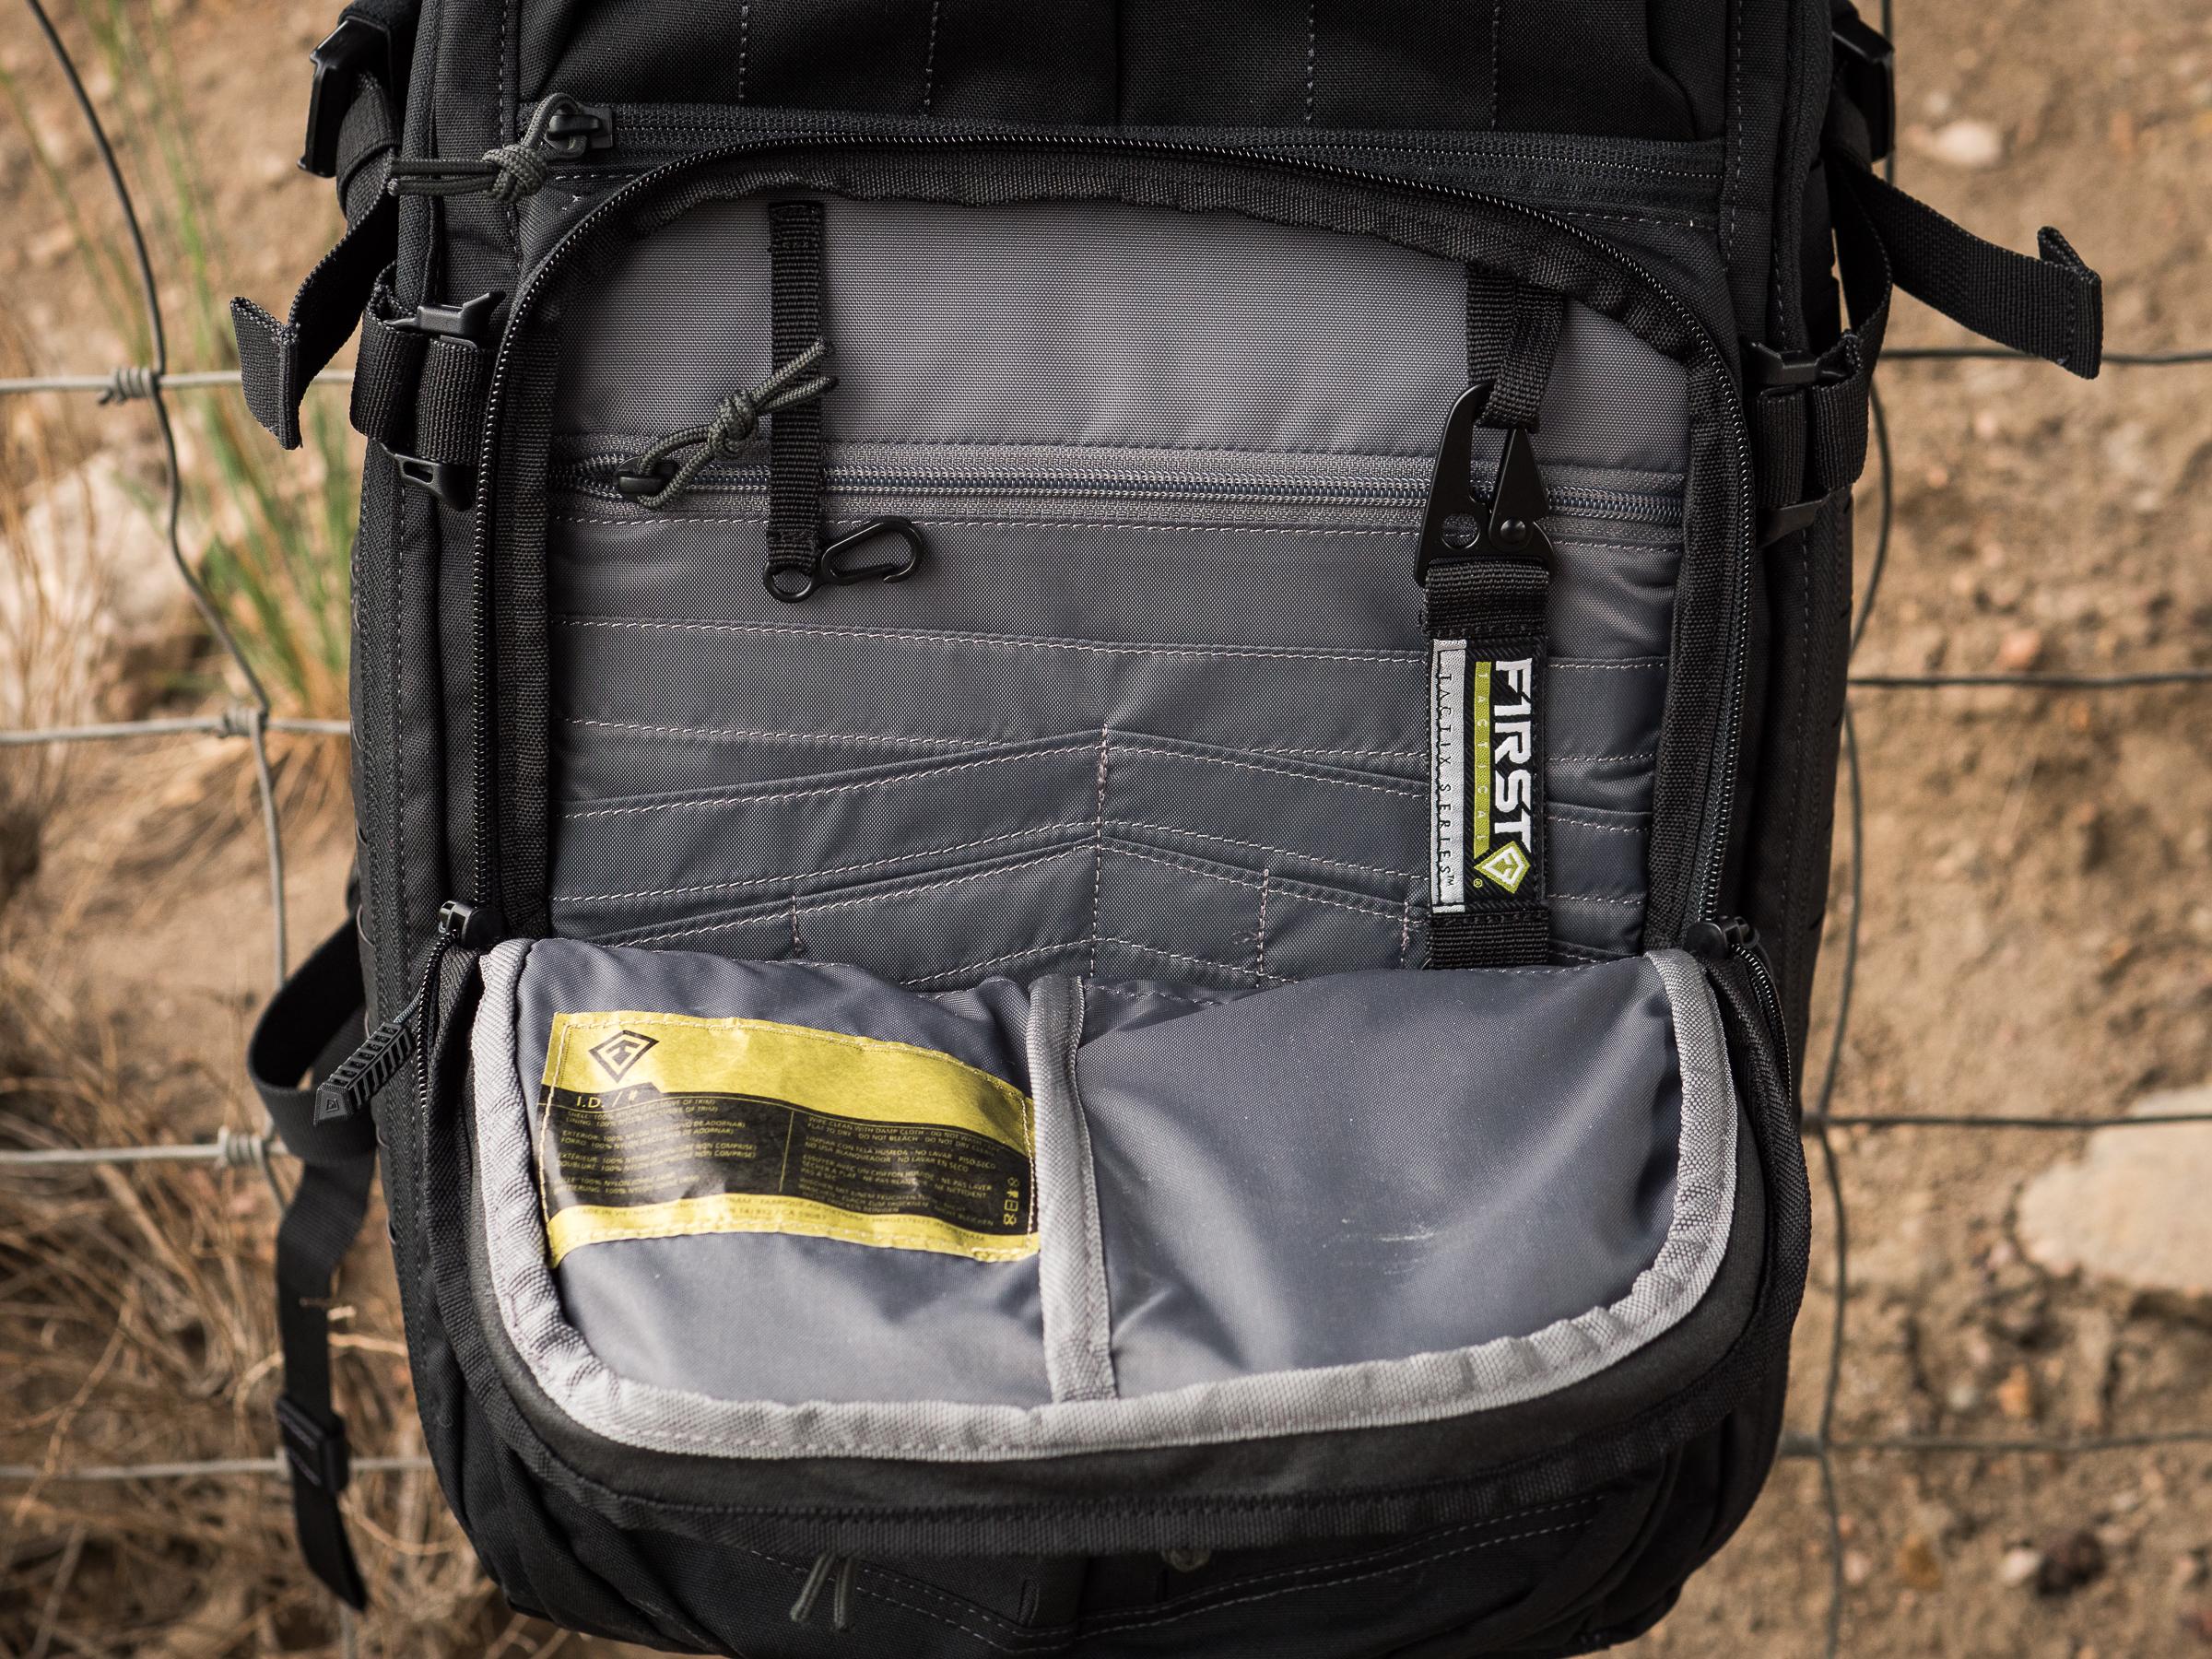 Tactix 1 Day Plus front pocket organization